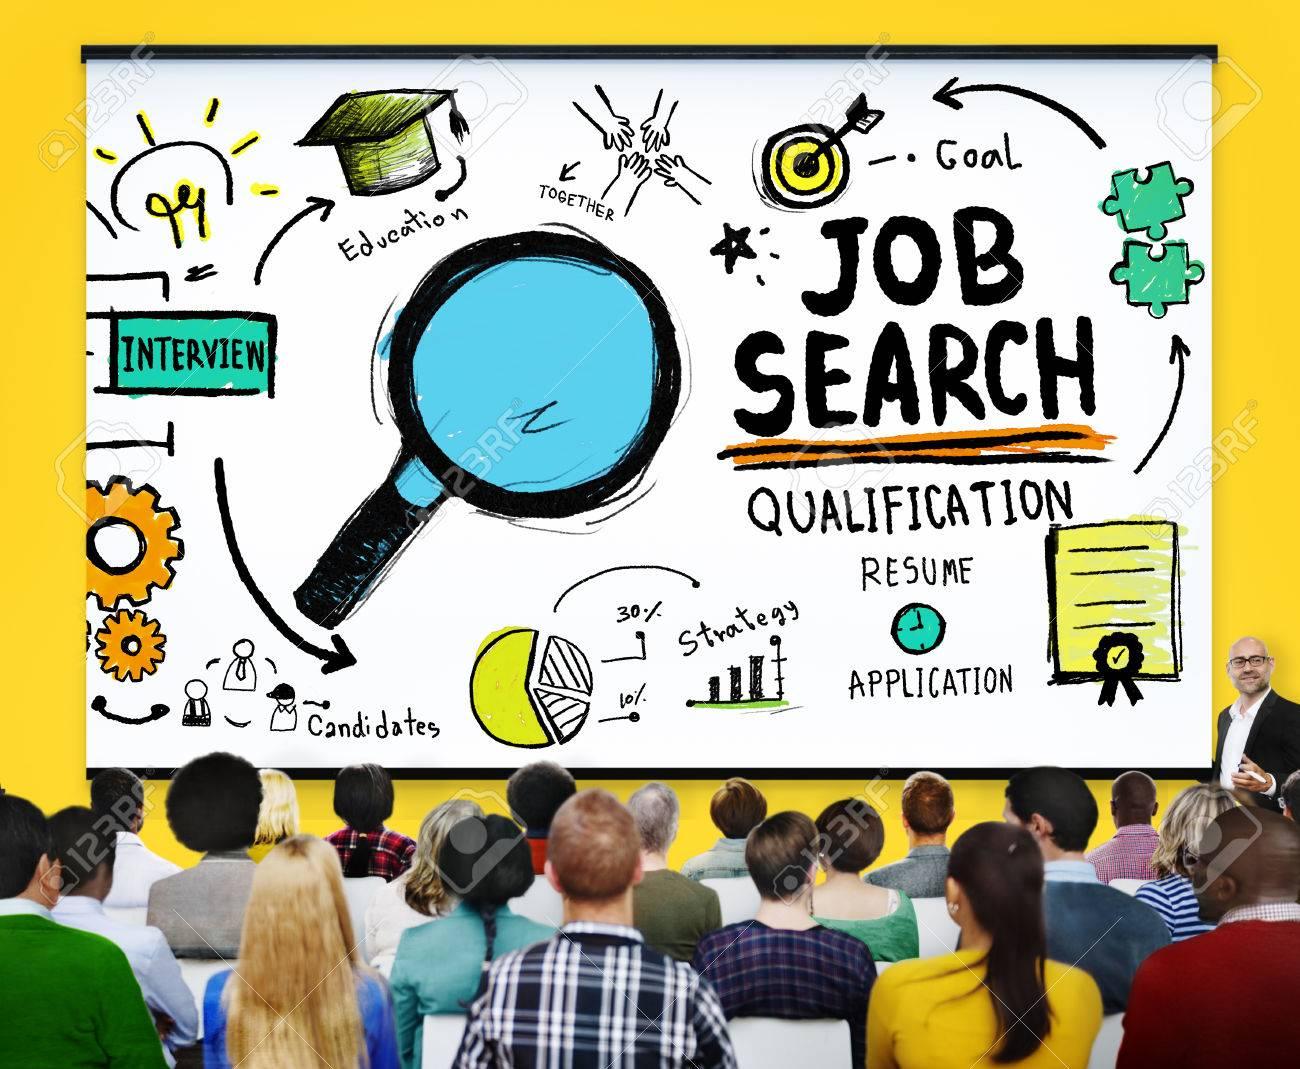 Job Search Qualification Resume Recruitment Hiring Application ...